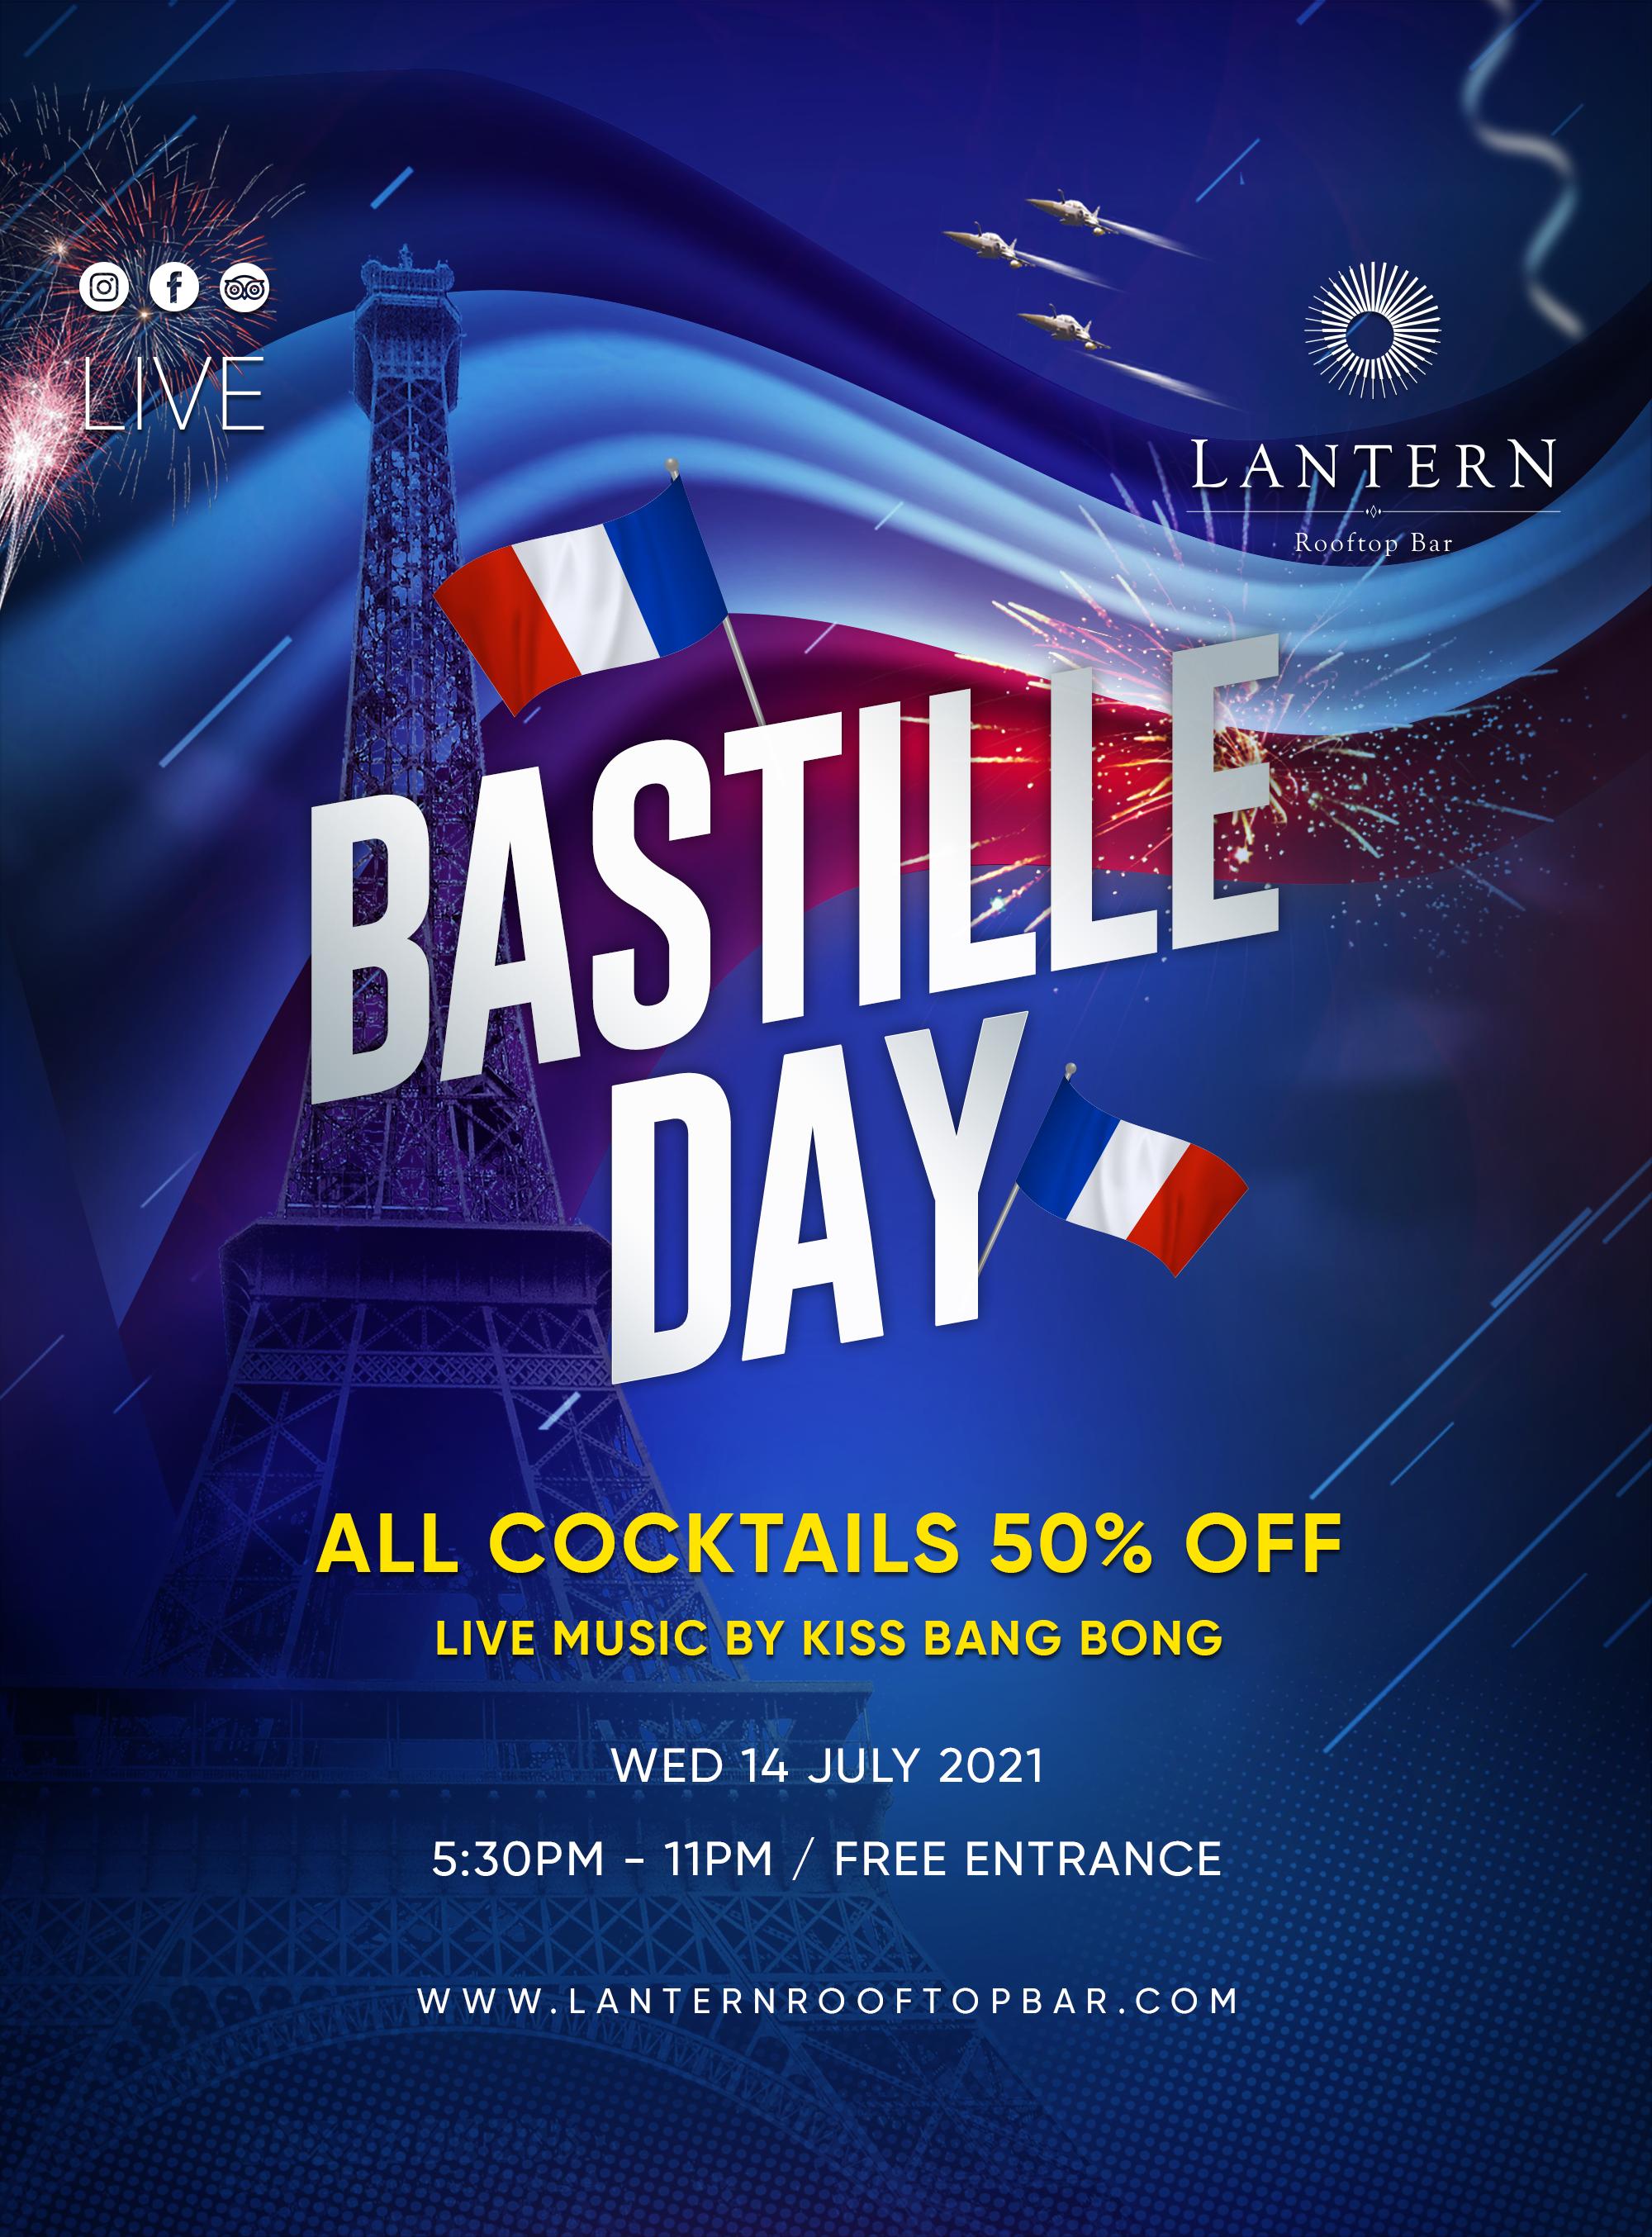 Lantern Bastille Dy 14 July 2021